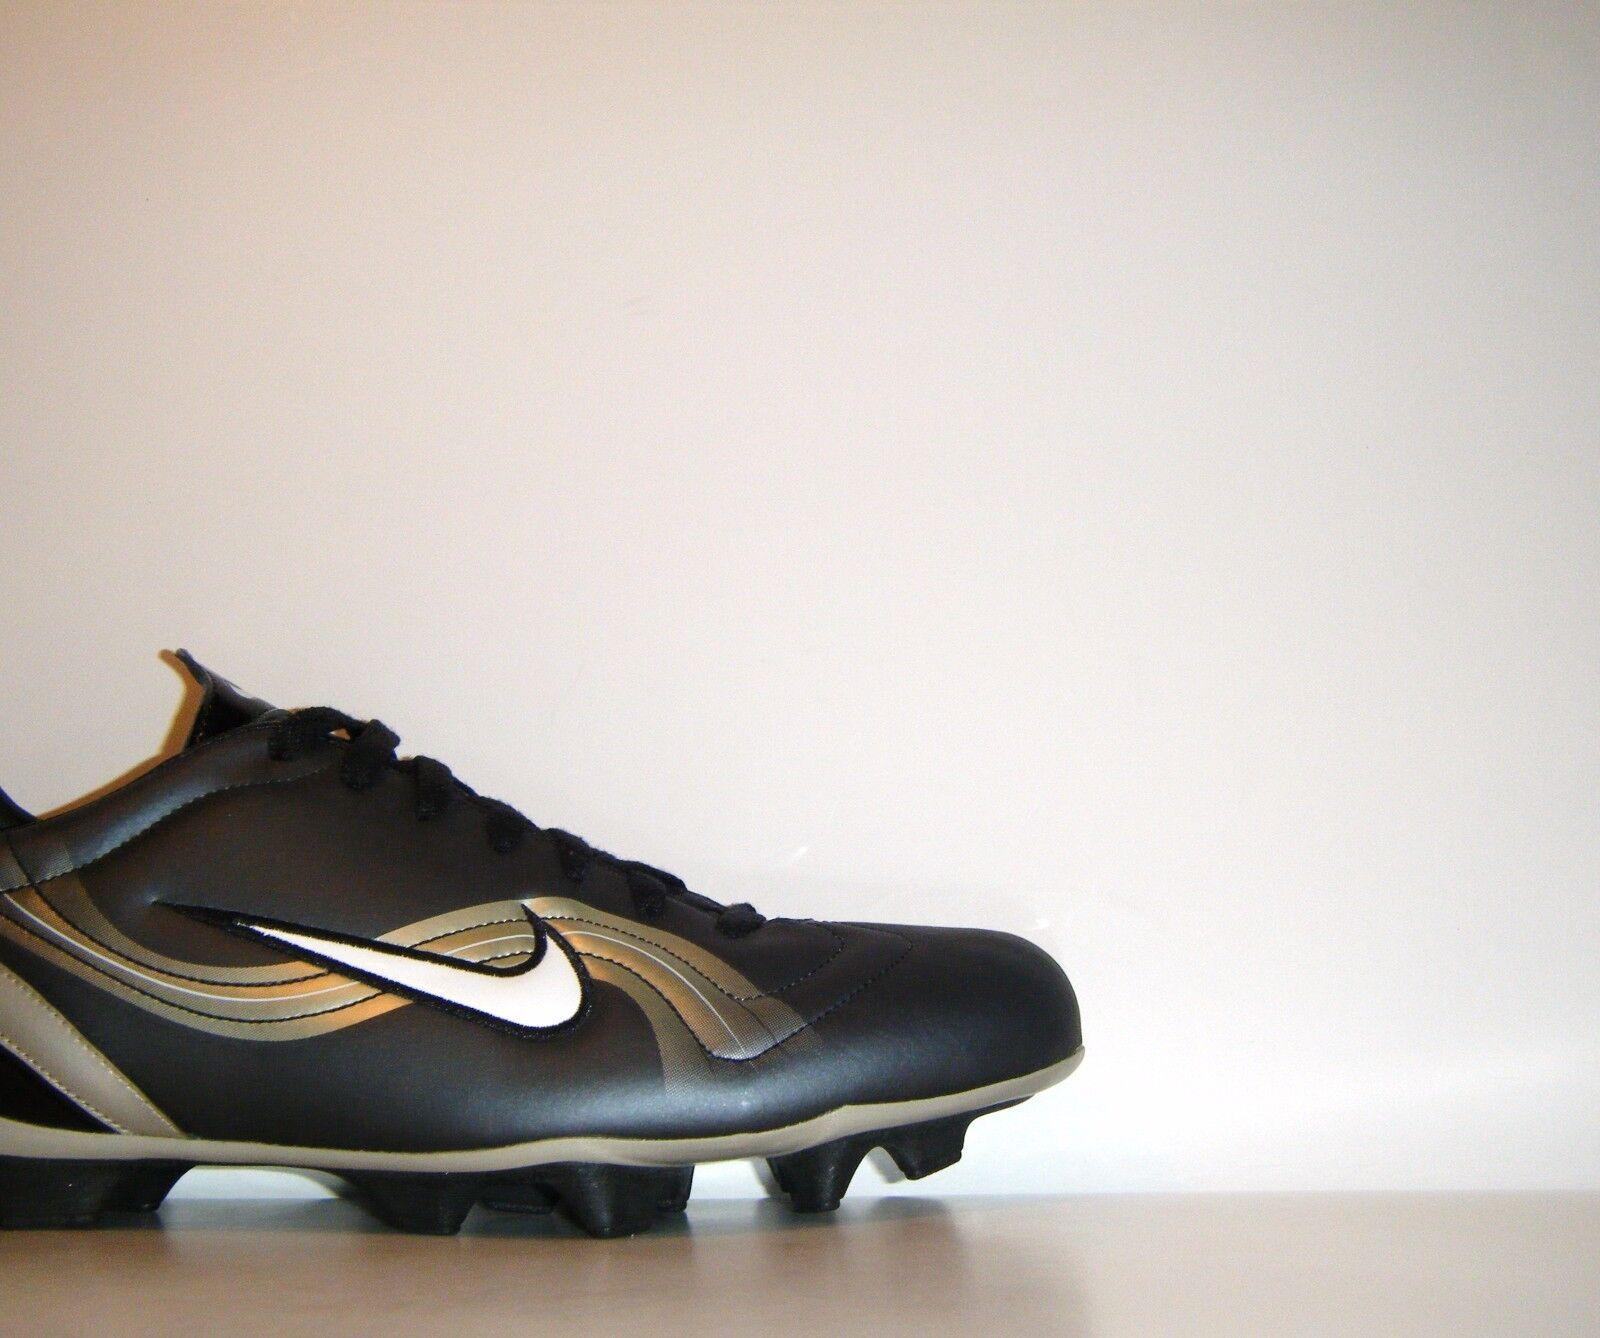 2002 Nike Mercurial Vapor I II FG Botines Talla 12 Negro oro Superfly III R9 CR7